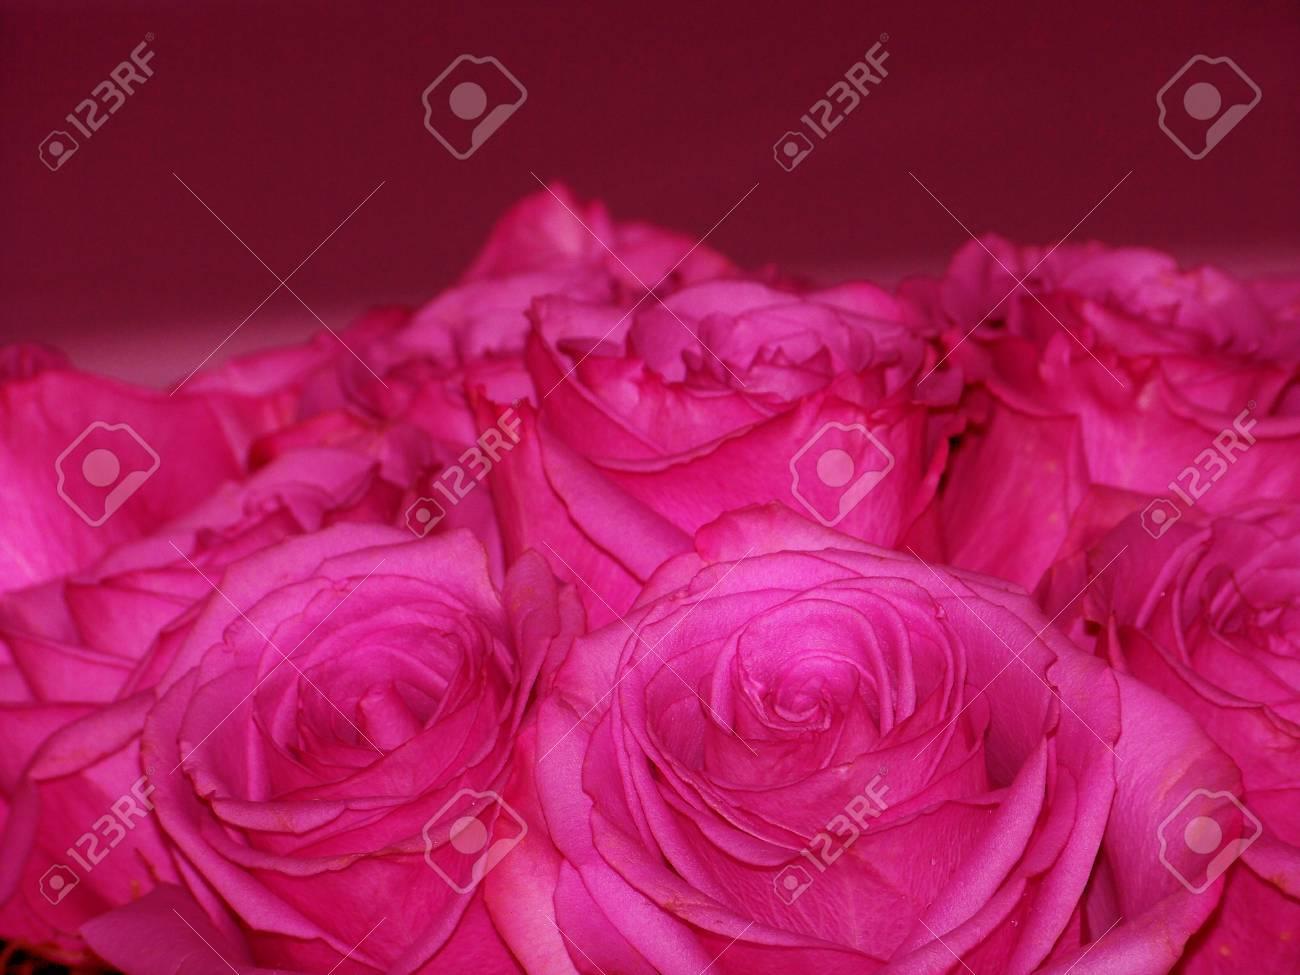 Intense pink roses romantic elegant Valentine Stock Photo - 12126721